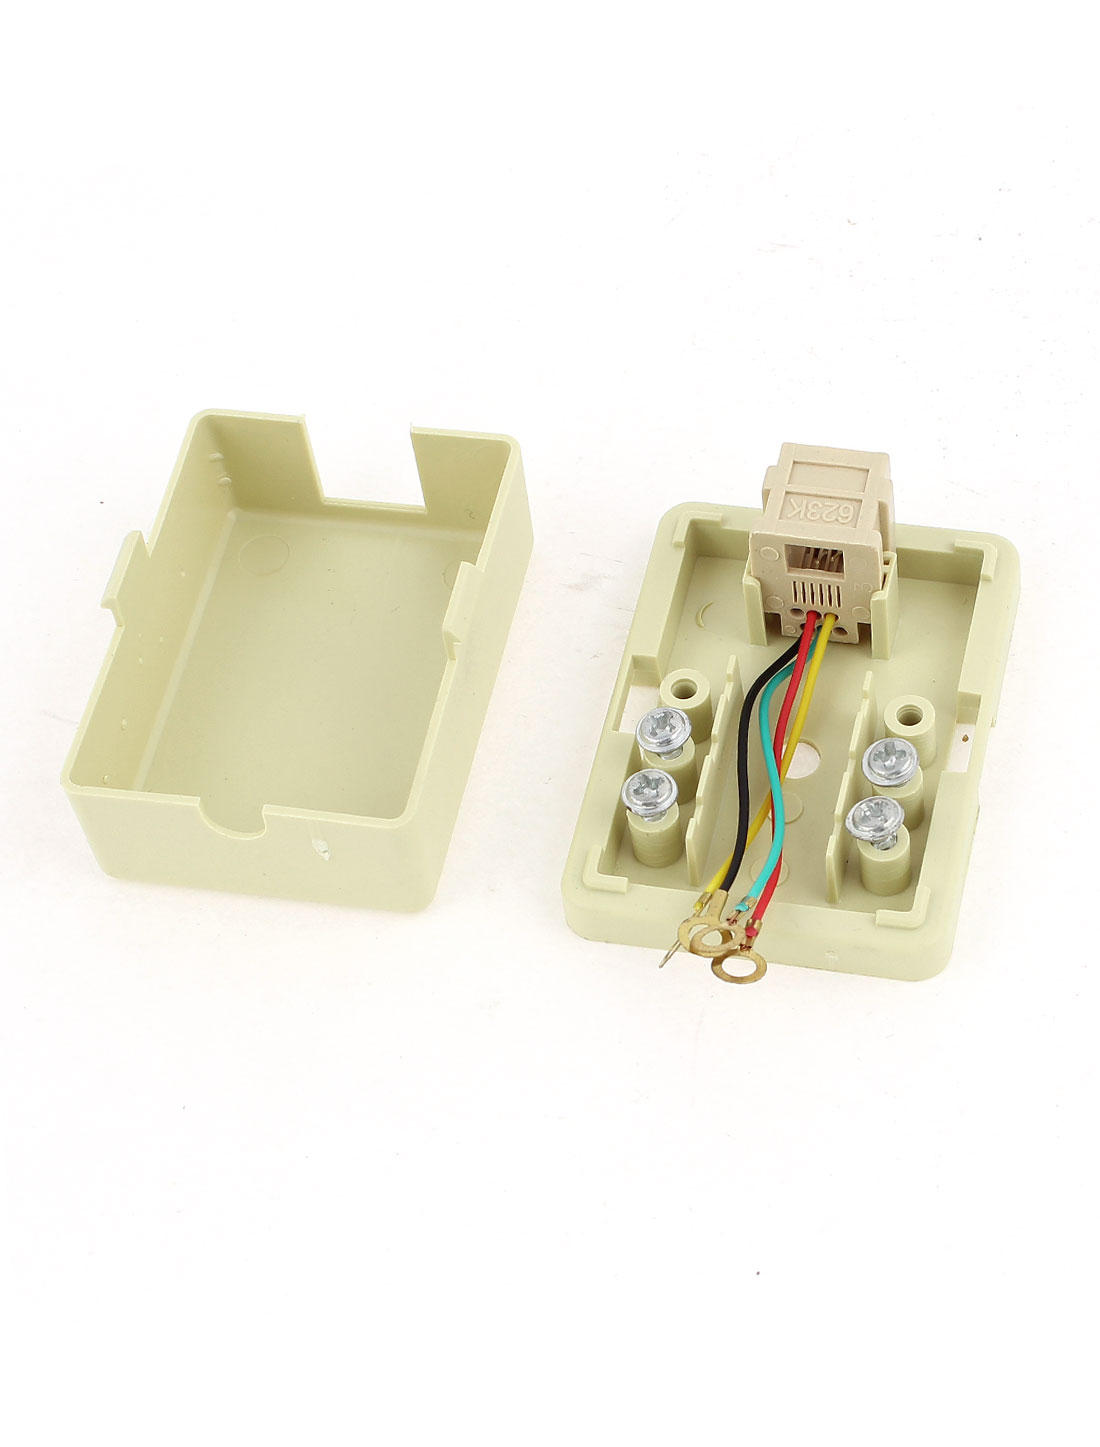 small resolution of wall mount keystone single port telephone phone jacks 6p4c rj11 walmart canada